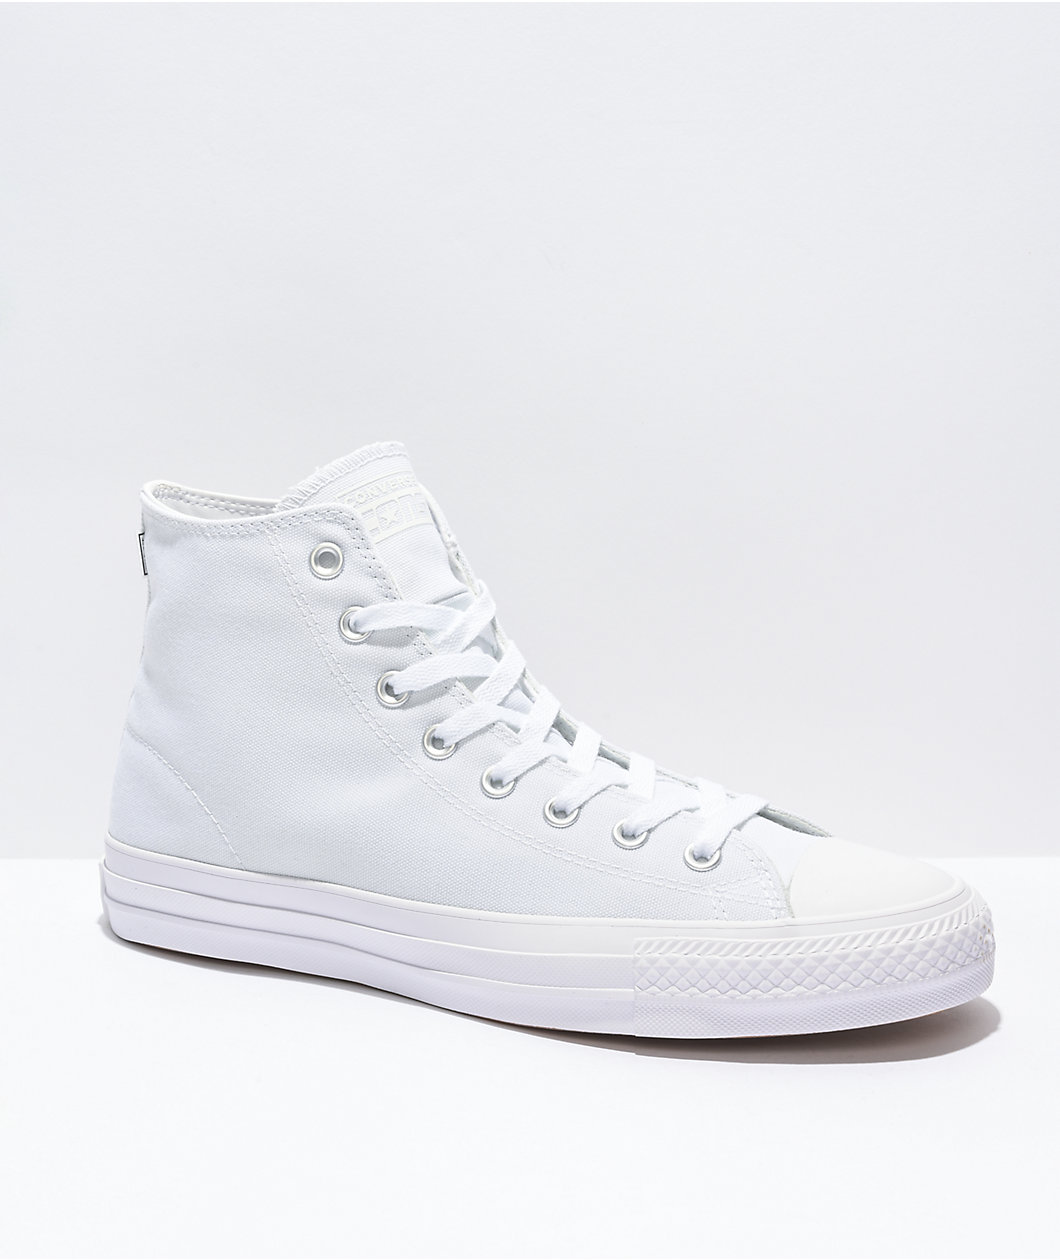 Converse CTAS Pro Hi All White Skate Shoes